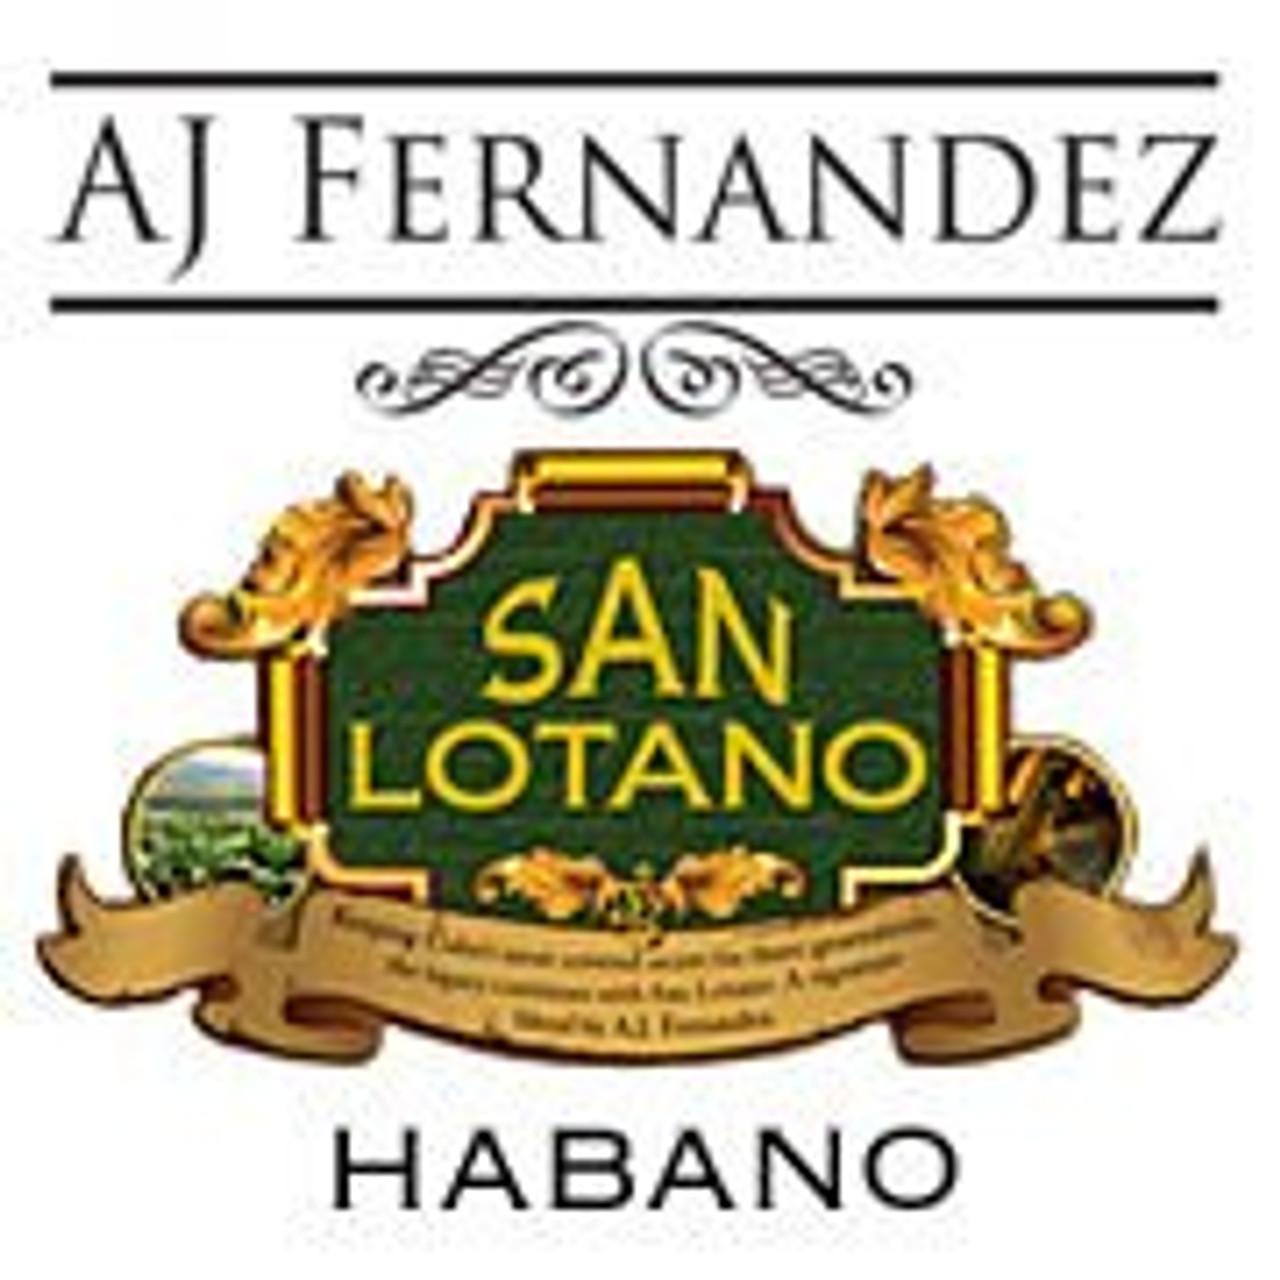 AJ Fernandez San Lotano Habano Toro - 6 x 54 Cigars (Box of 20)